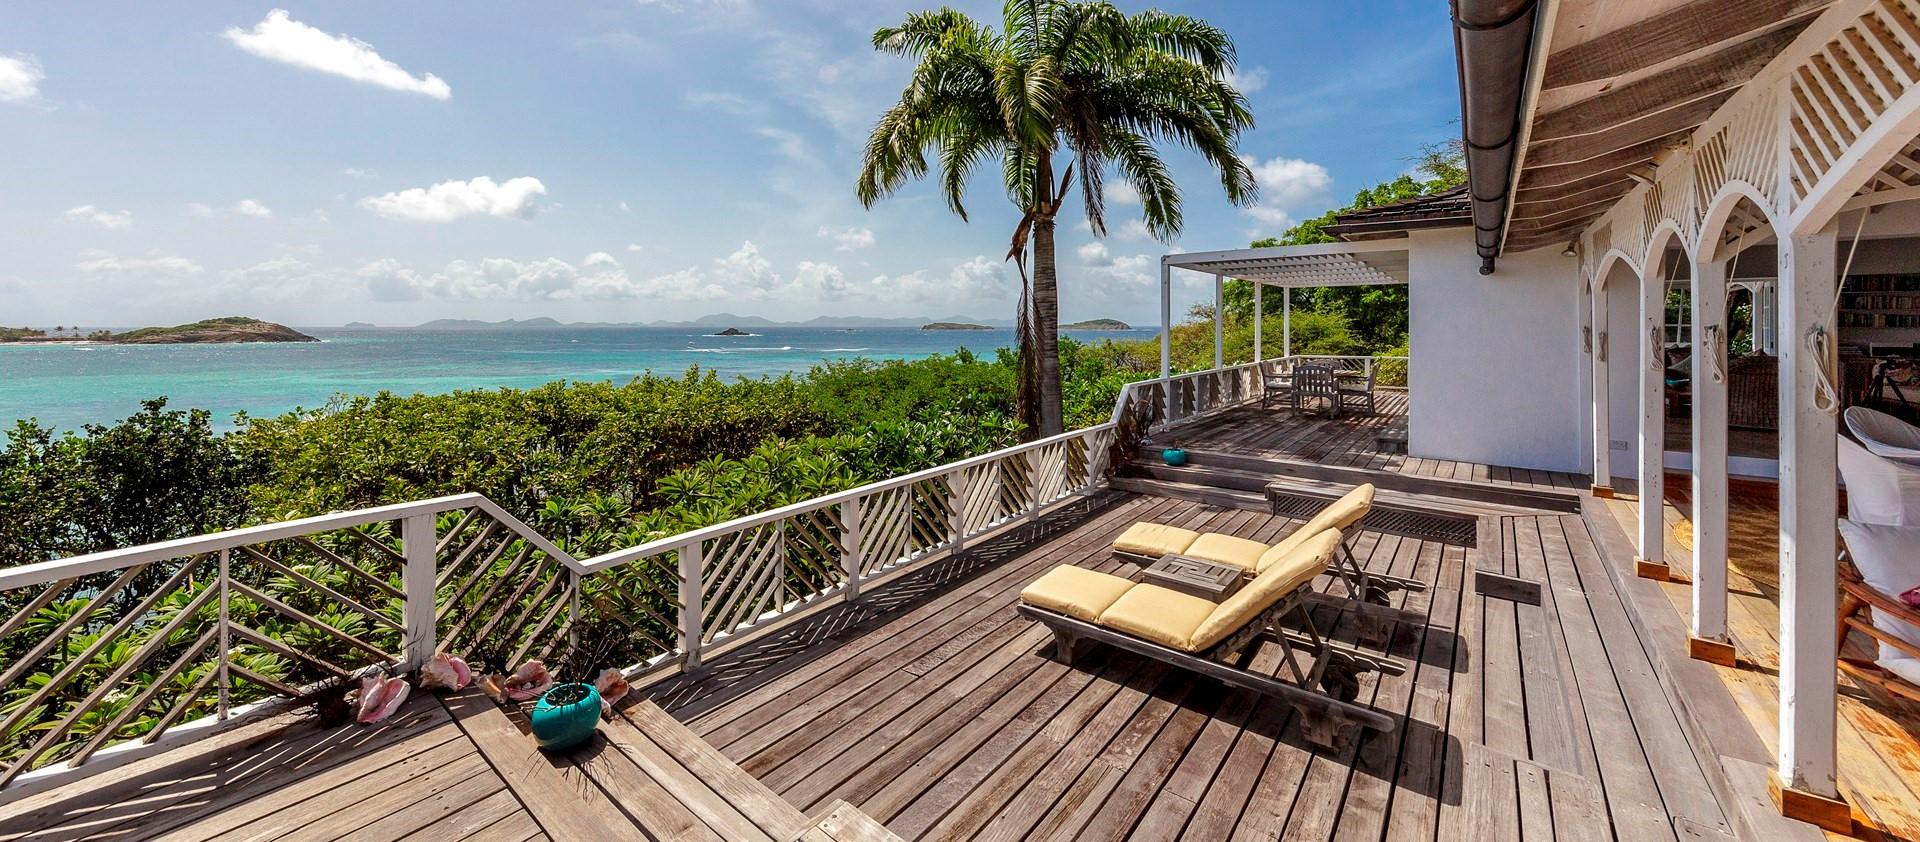 villa-moana-mustique-seaview-deck